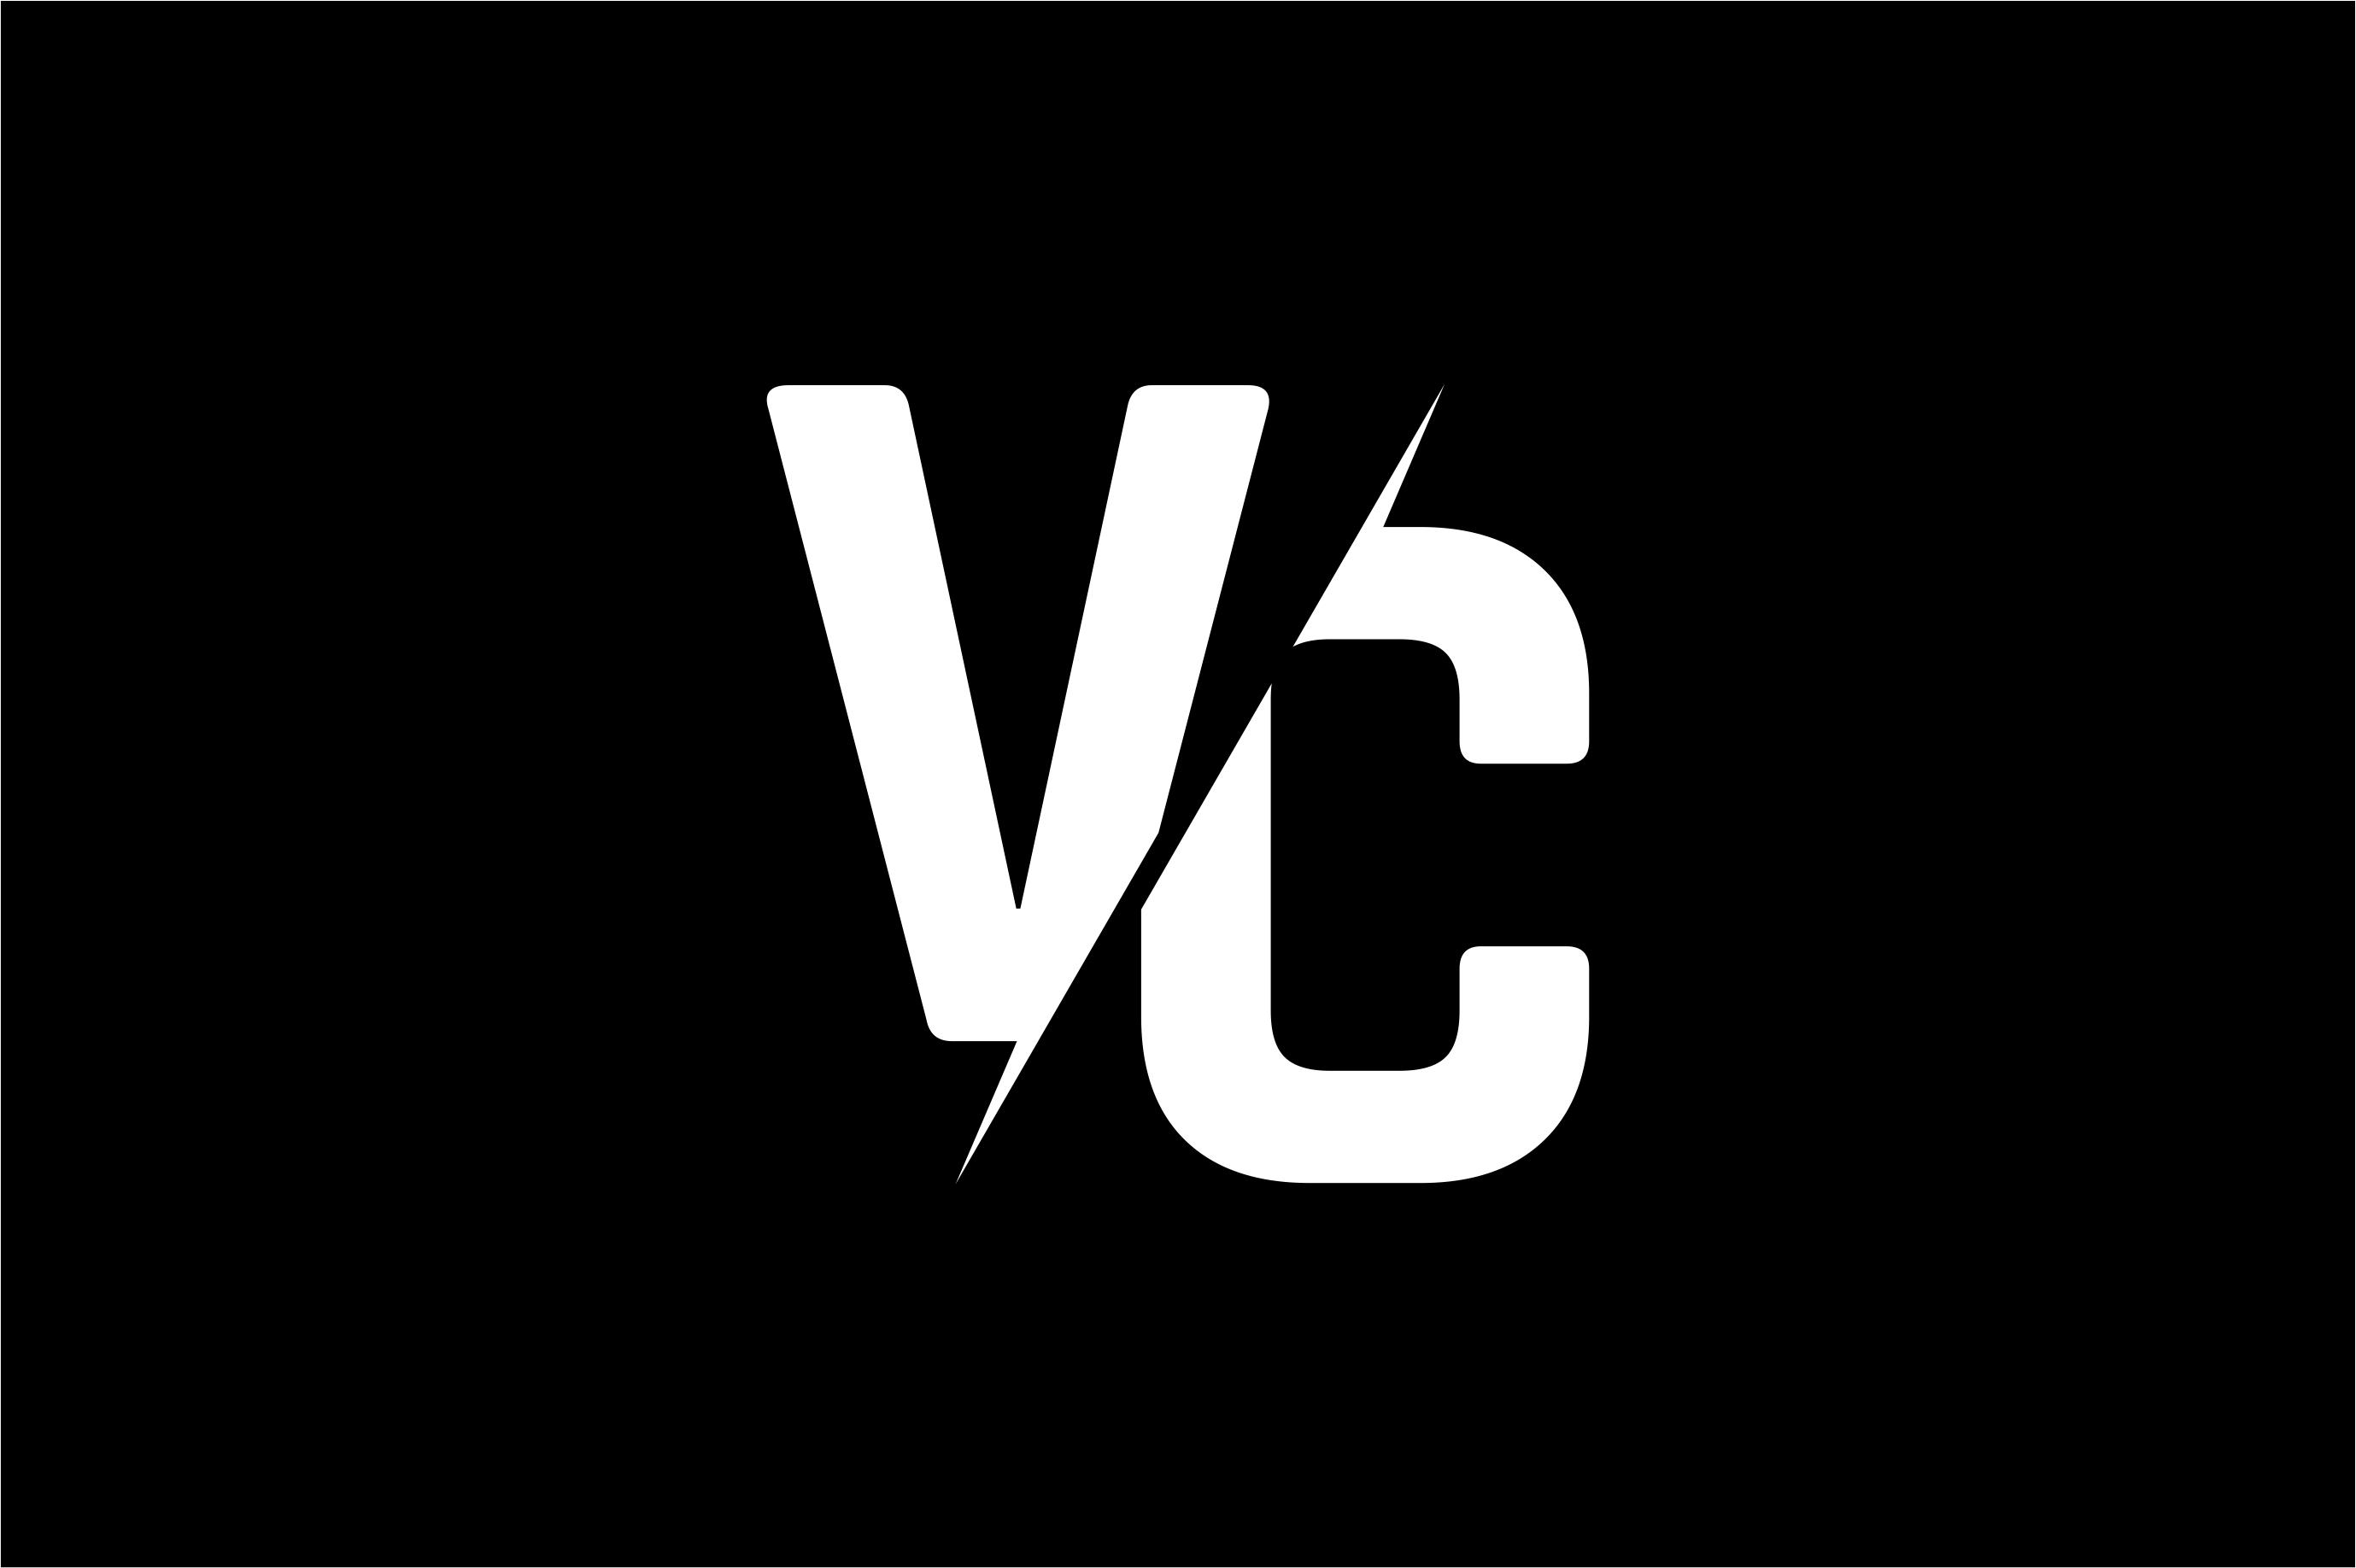 Monogram VC Logo Design.